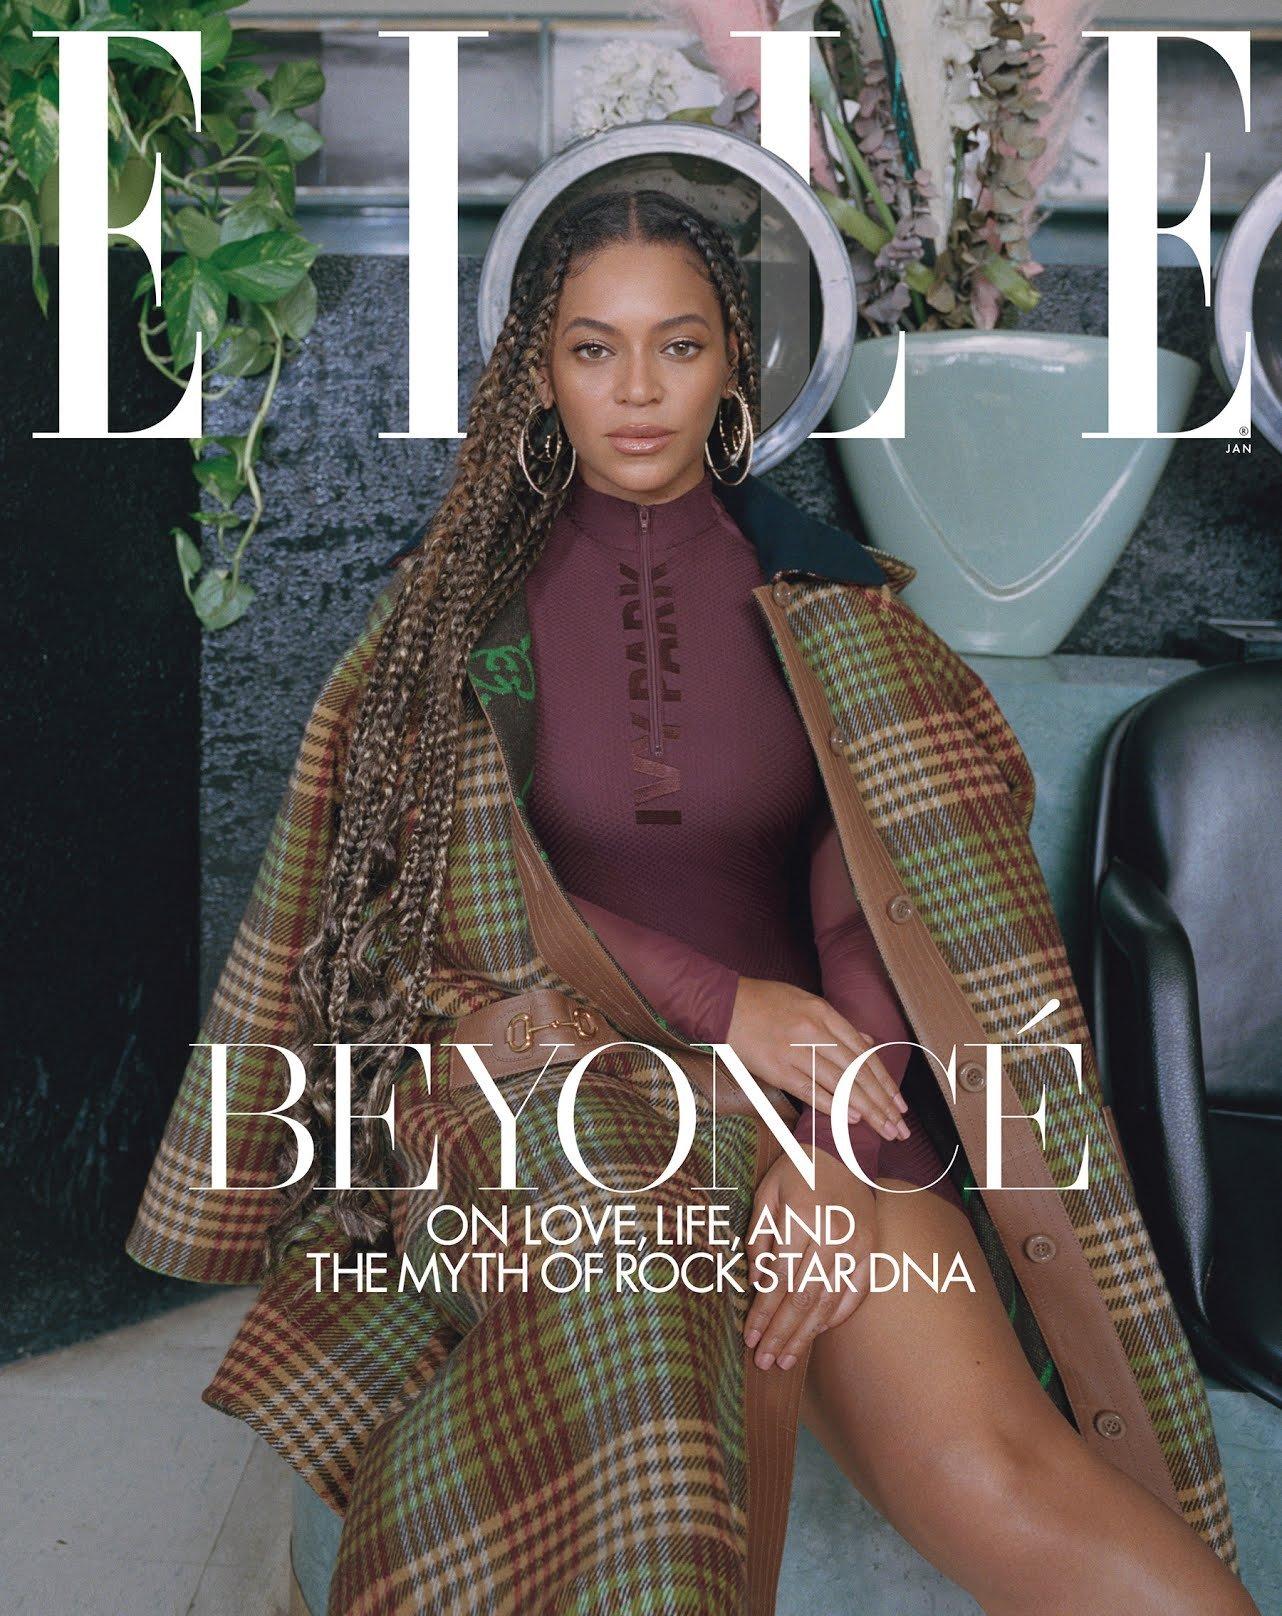 Beyoncé Covers Elle  January; talks Life, Love and Those Pregnancy Rumors